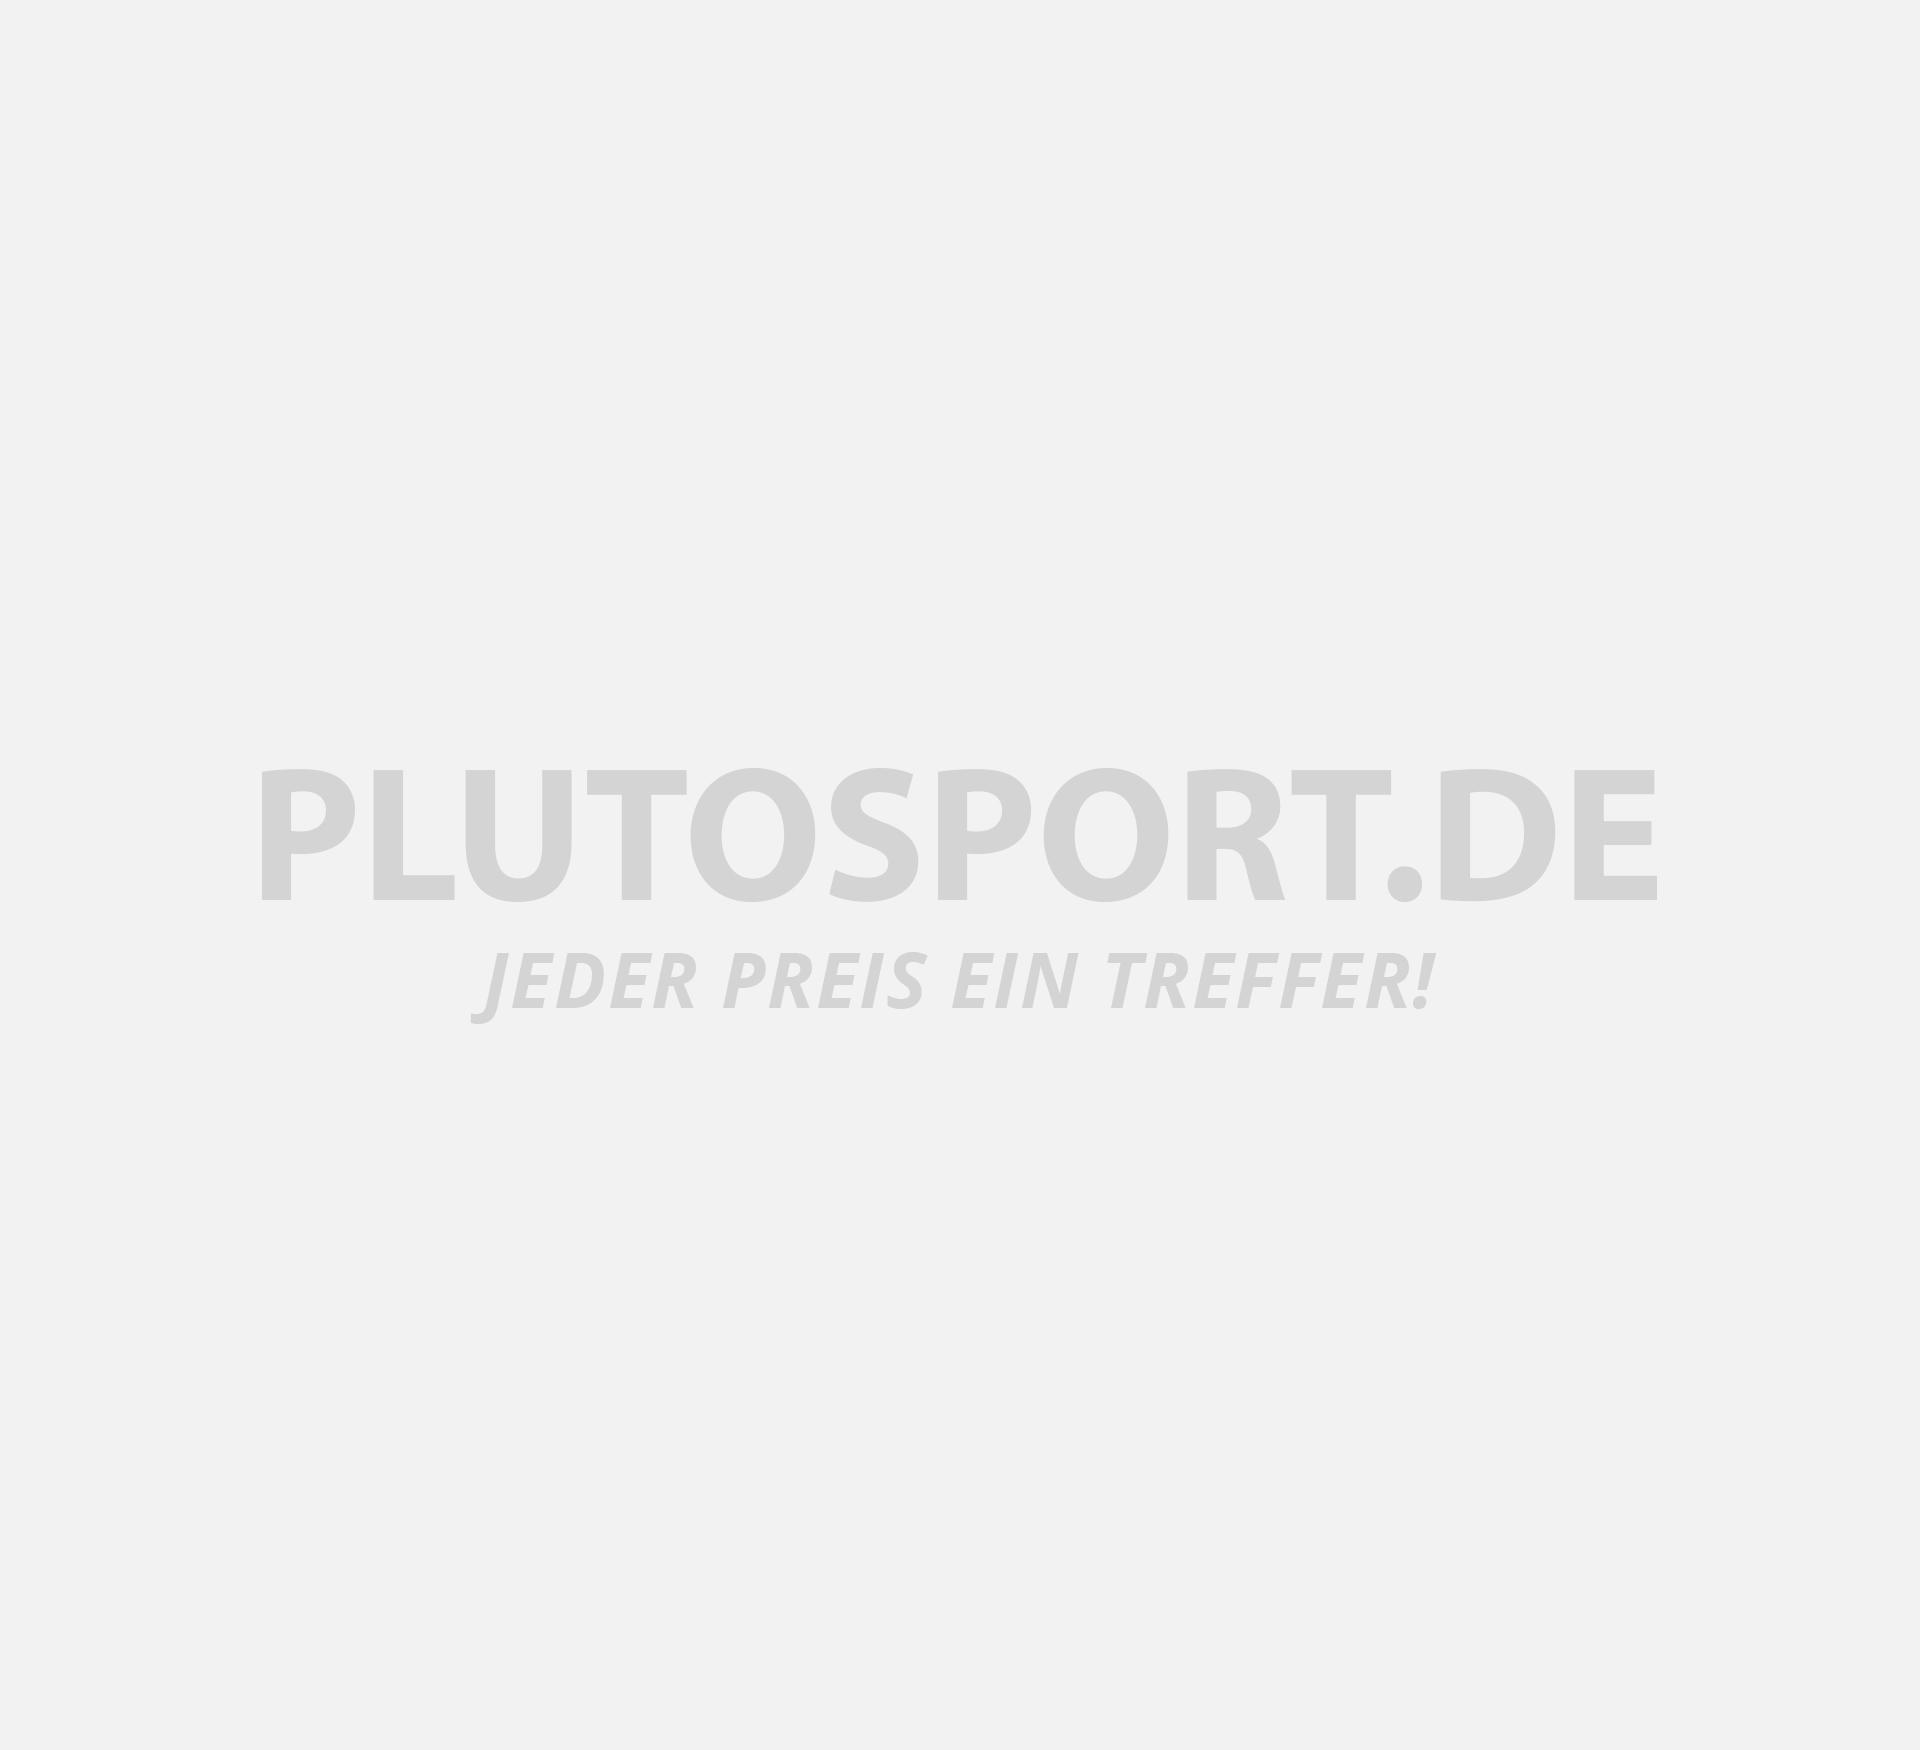 new product 4d963 91ac7 Lacoste Trainingsanzug Herren autoankauf-wesel.de